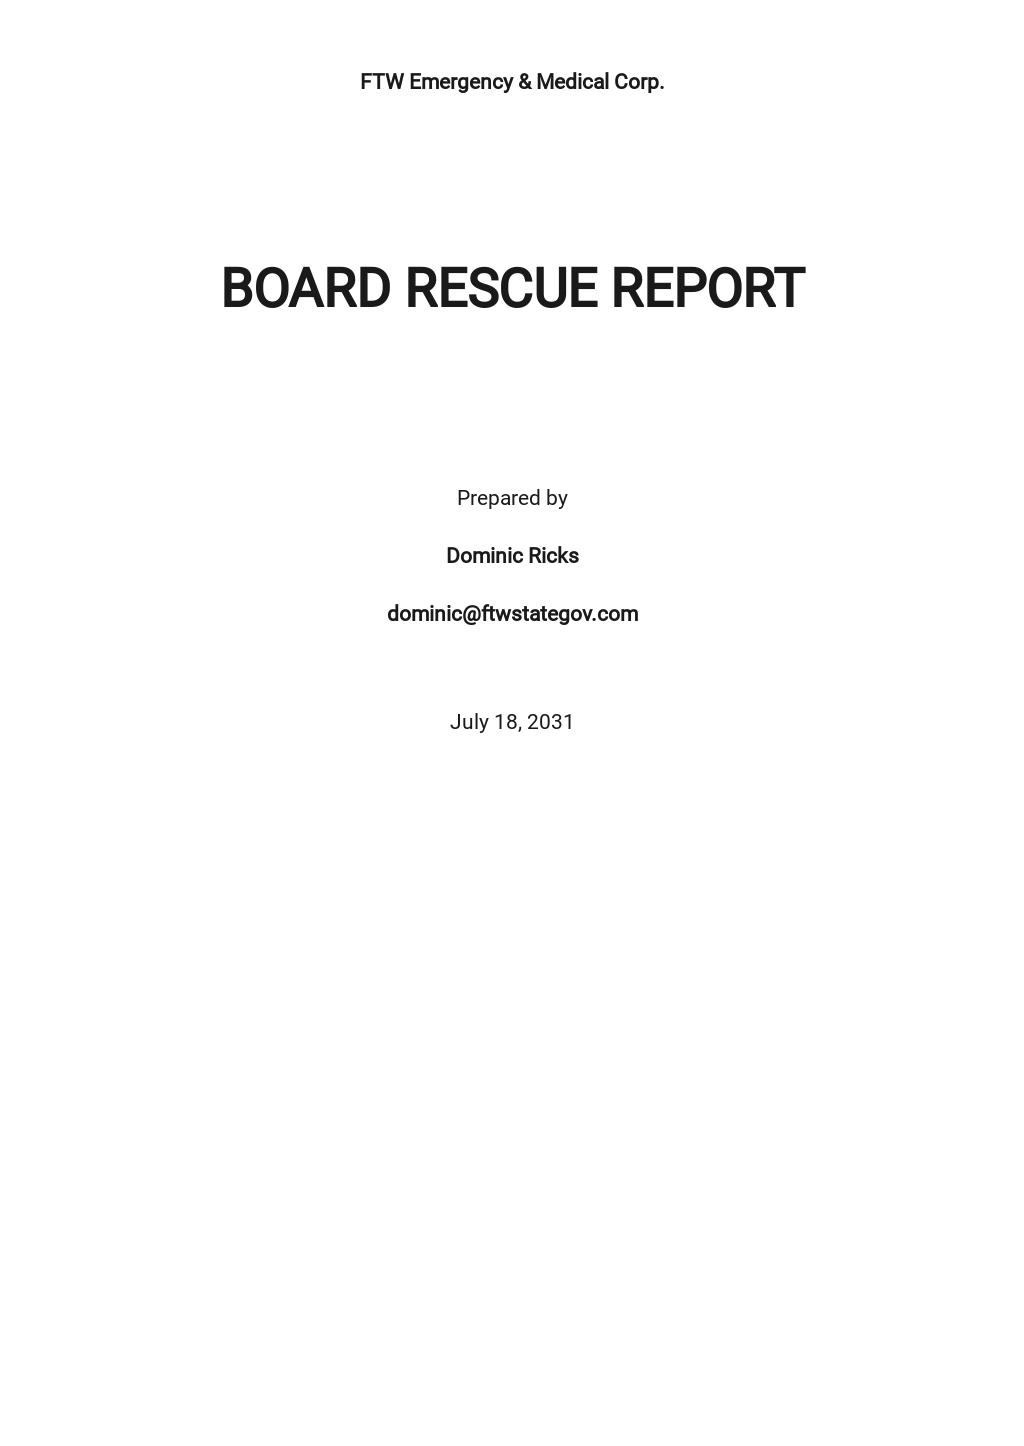 Board Rescue Report Template.jpe